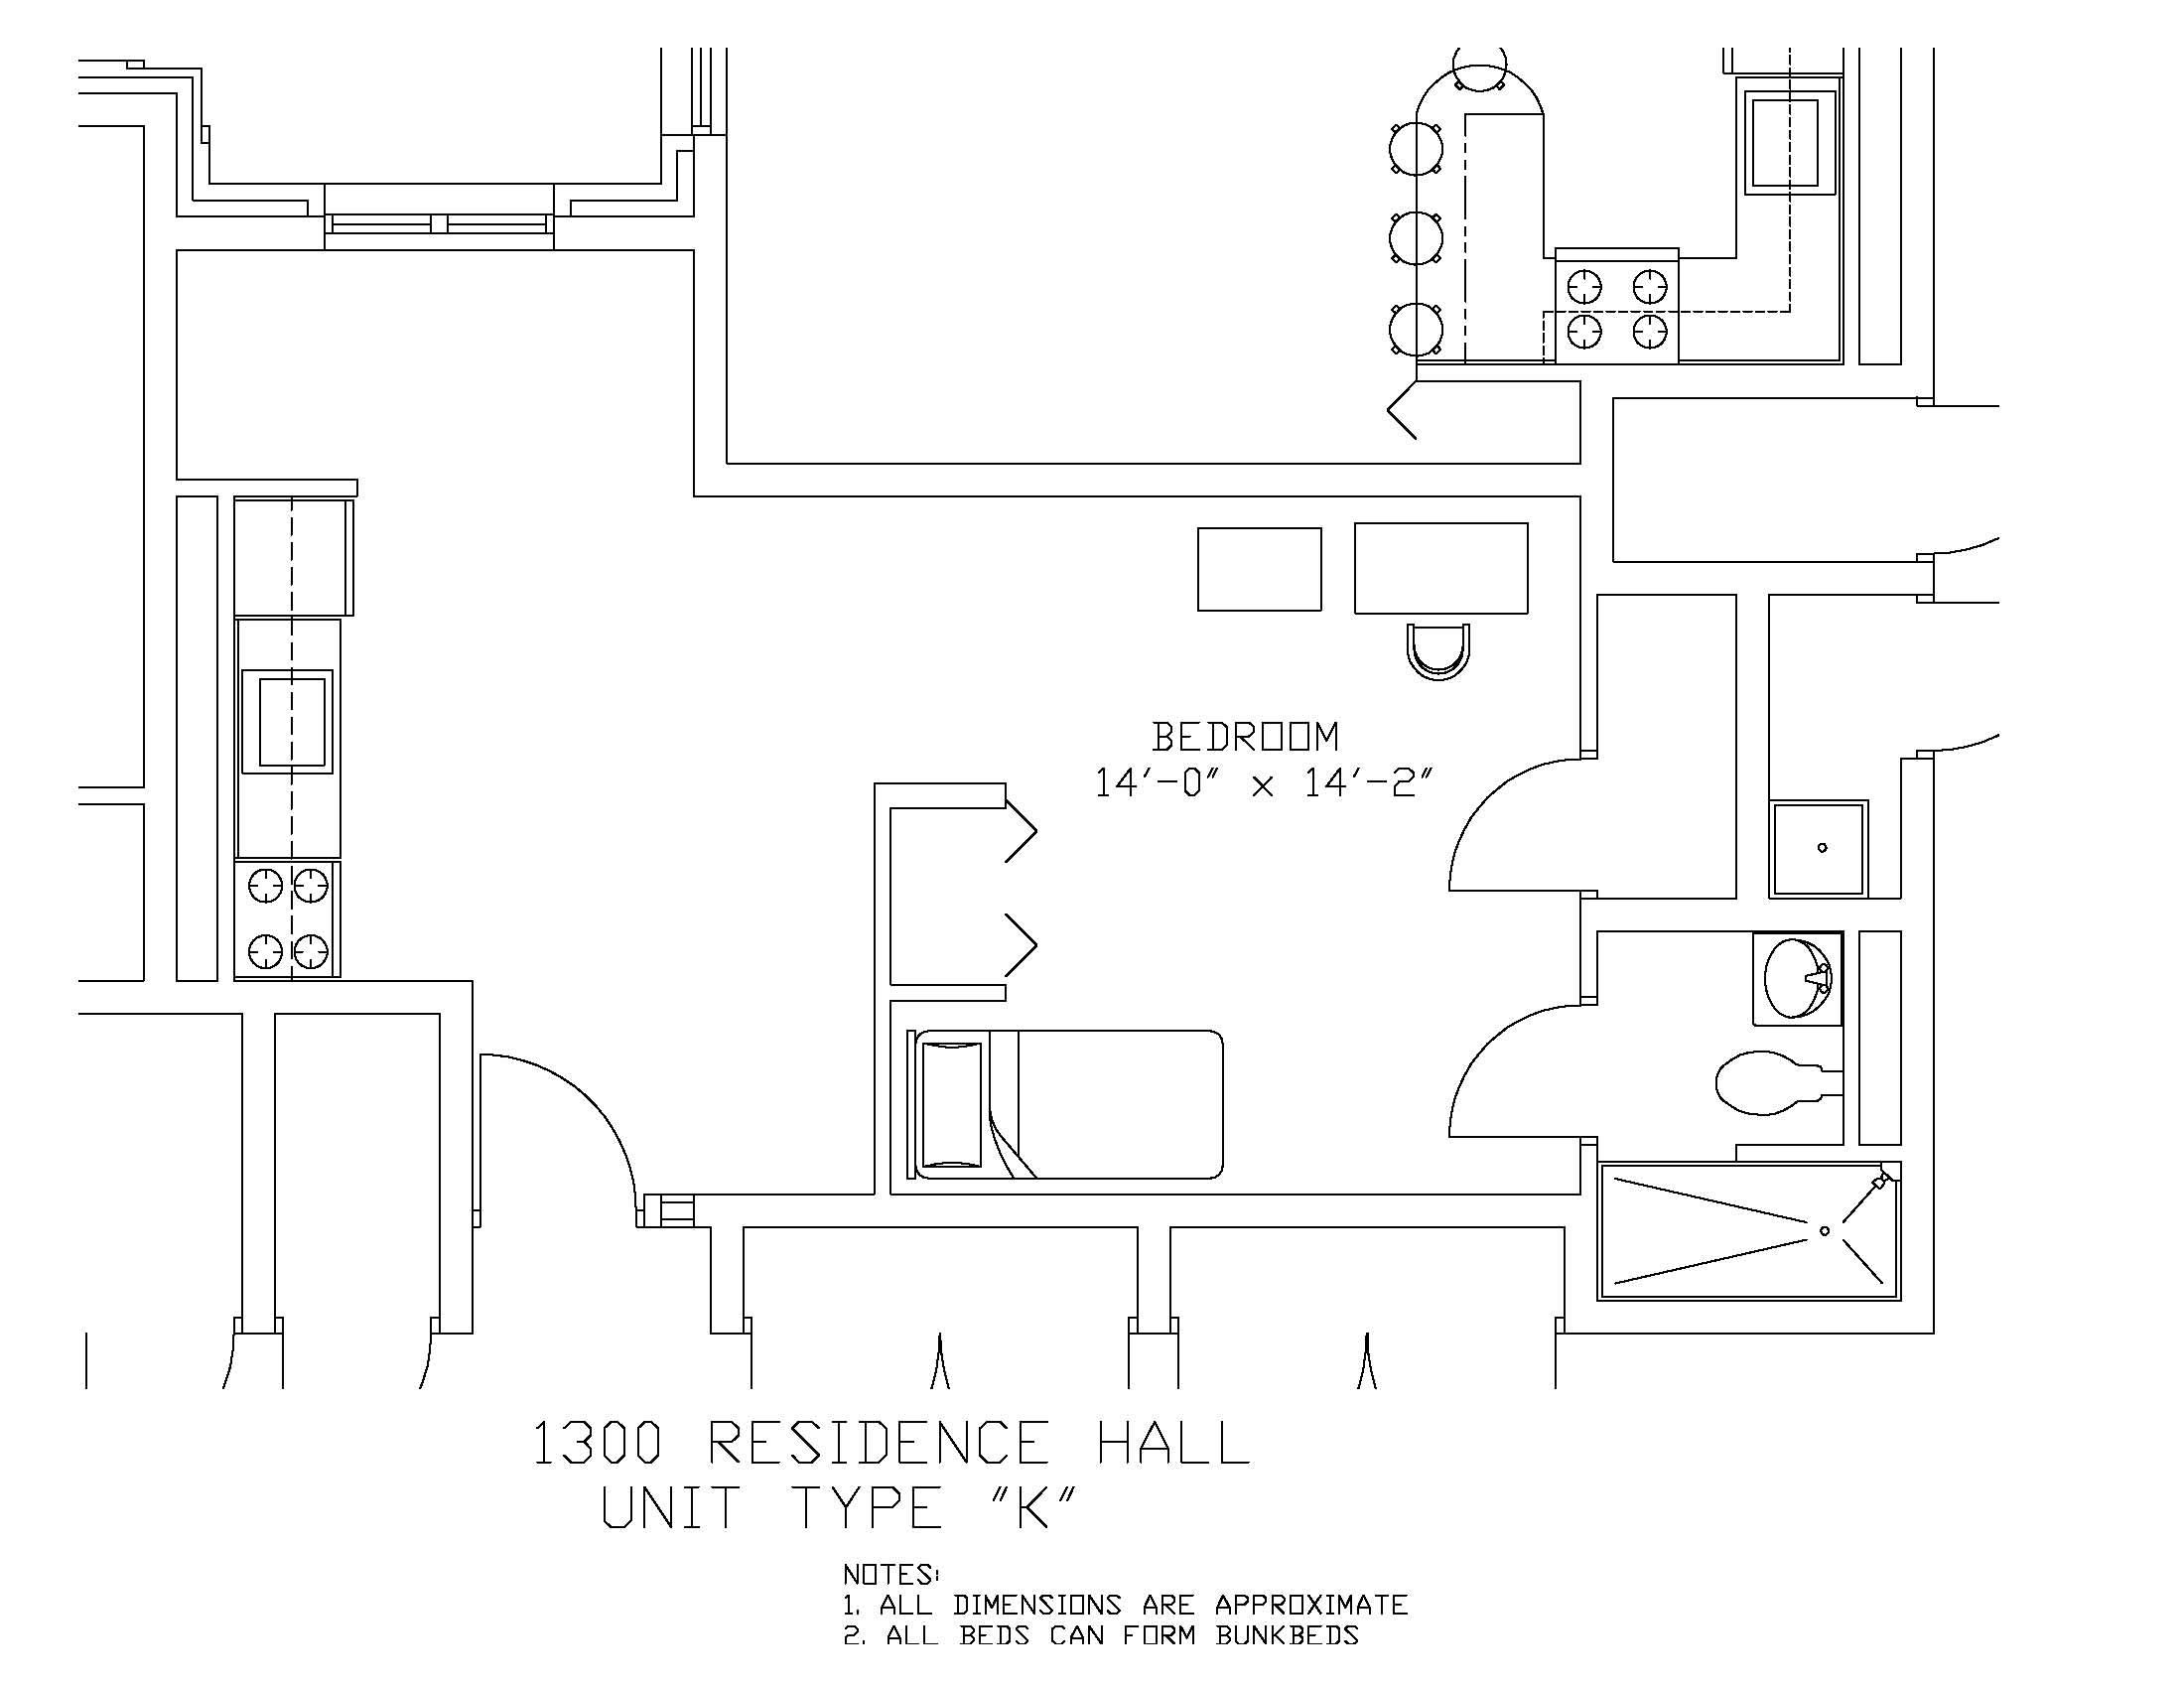 1300 Residence Hall: Type K